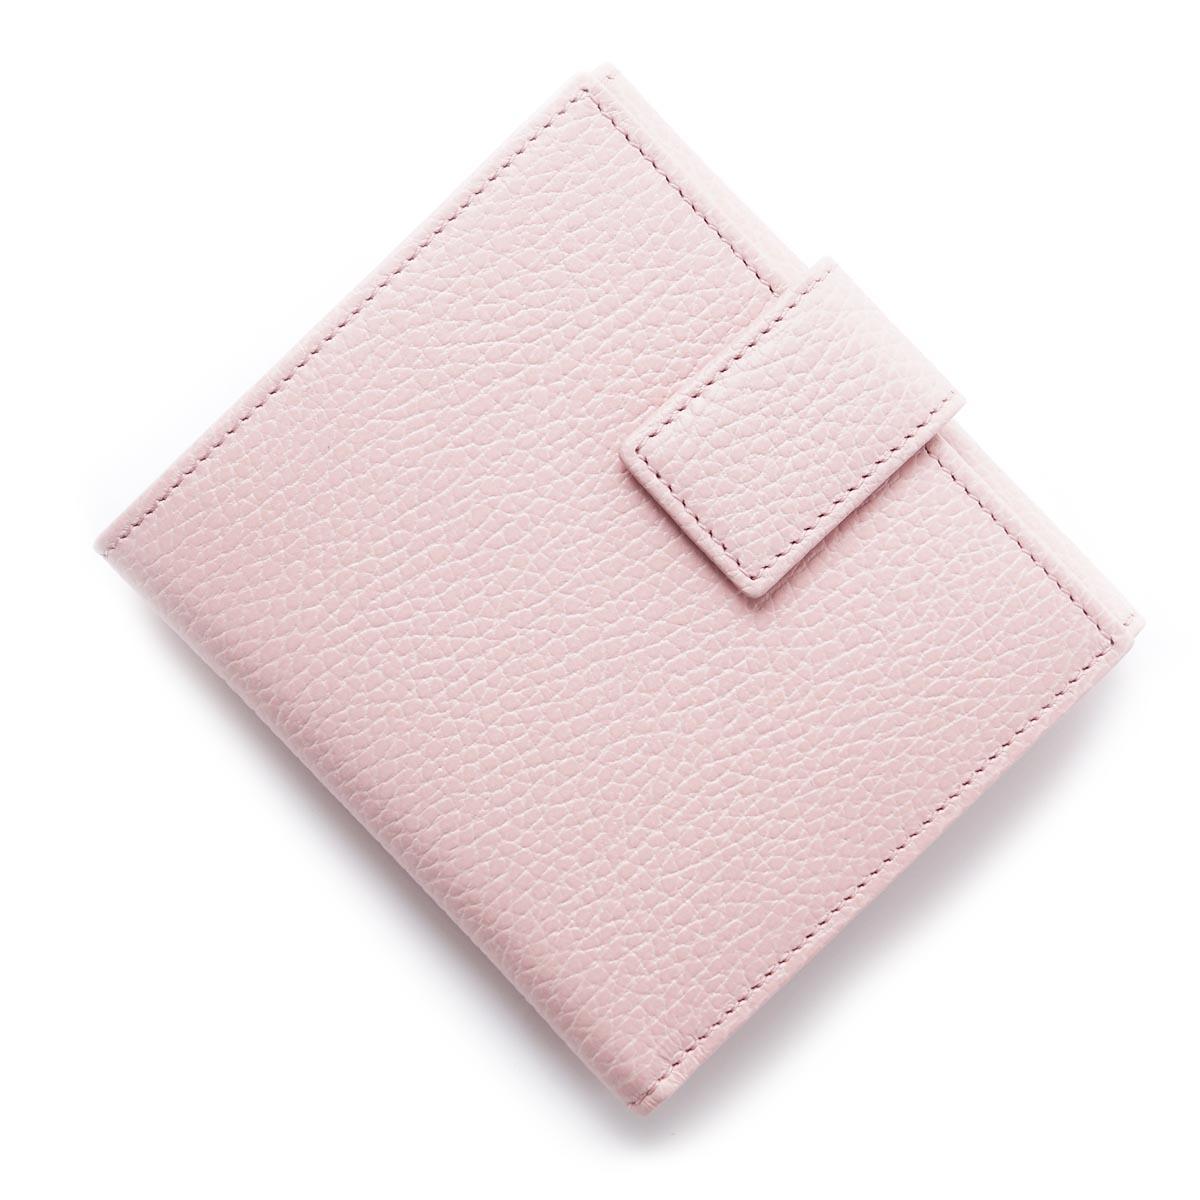 古驰GUCCI 2个机会钱包[有硬币袋]PETITE MARMONT LEATHER粉红粉红派456122 cao0g 5909女士